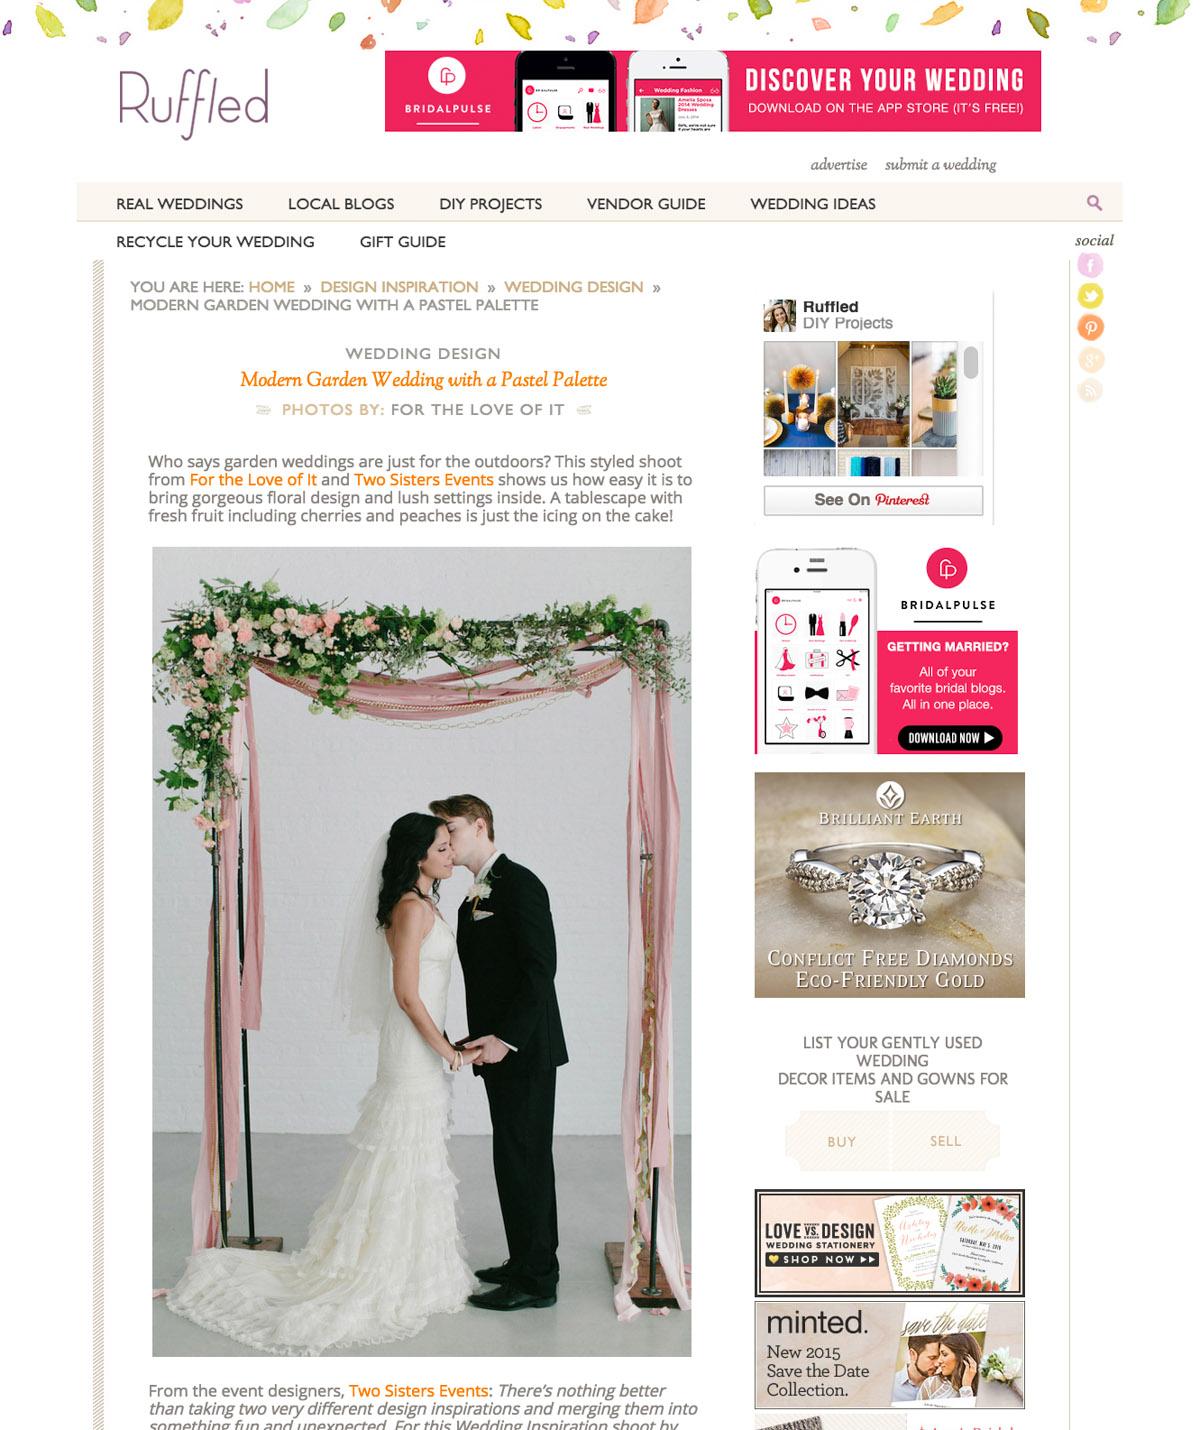 Ruffled Blog wedding feature of Chez Chicago-001.jpg